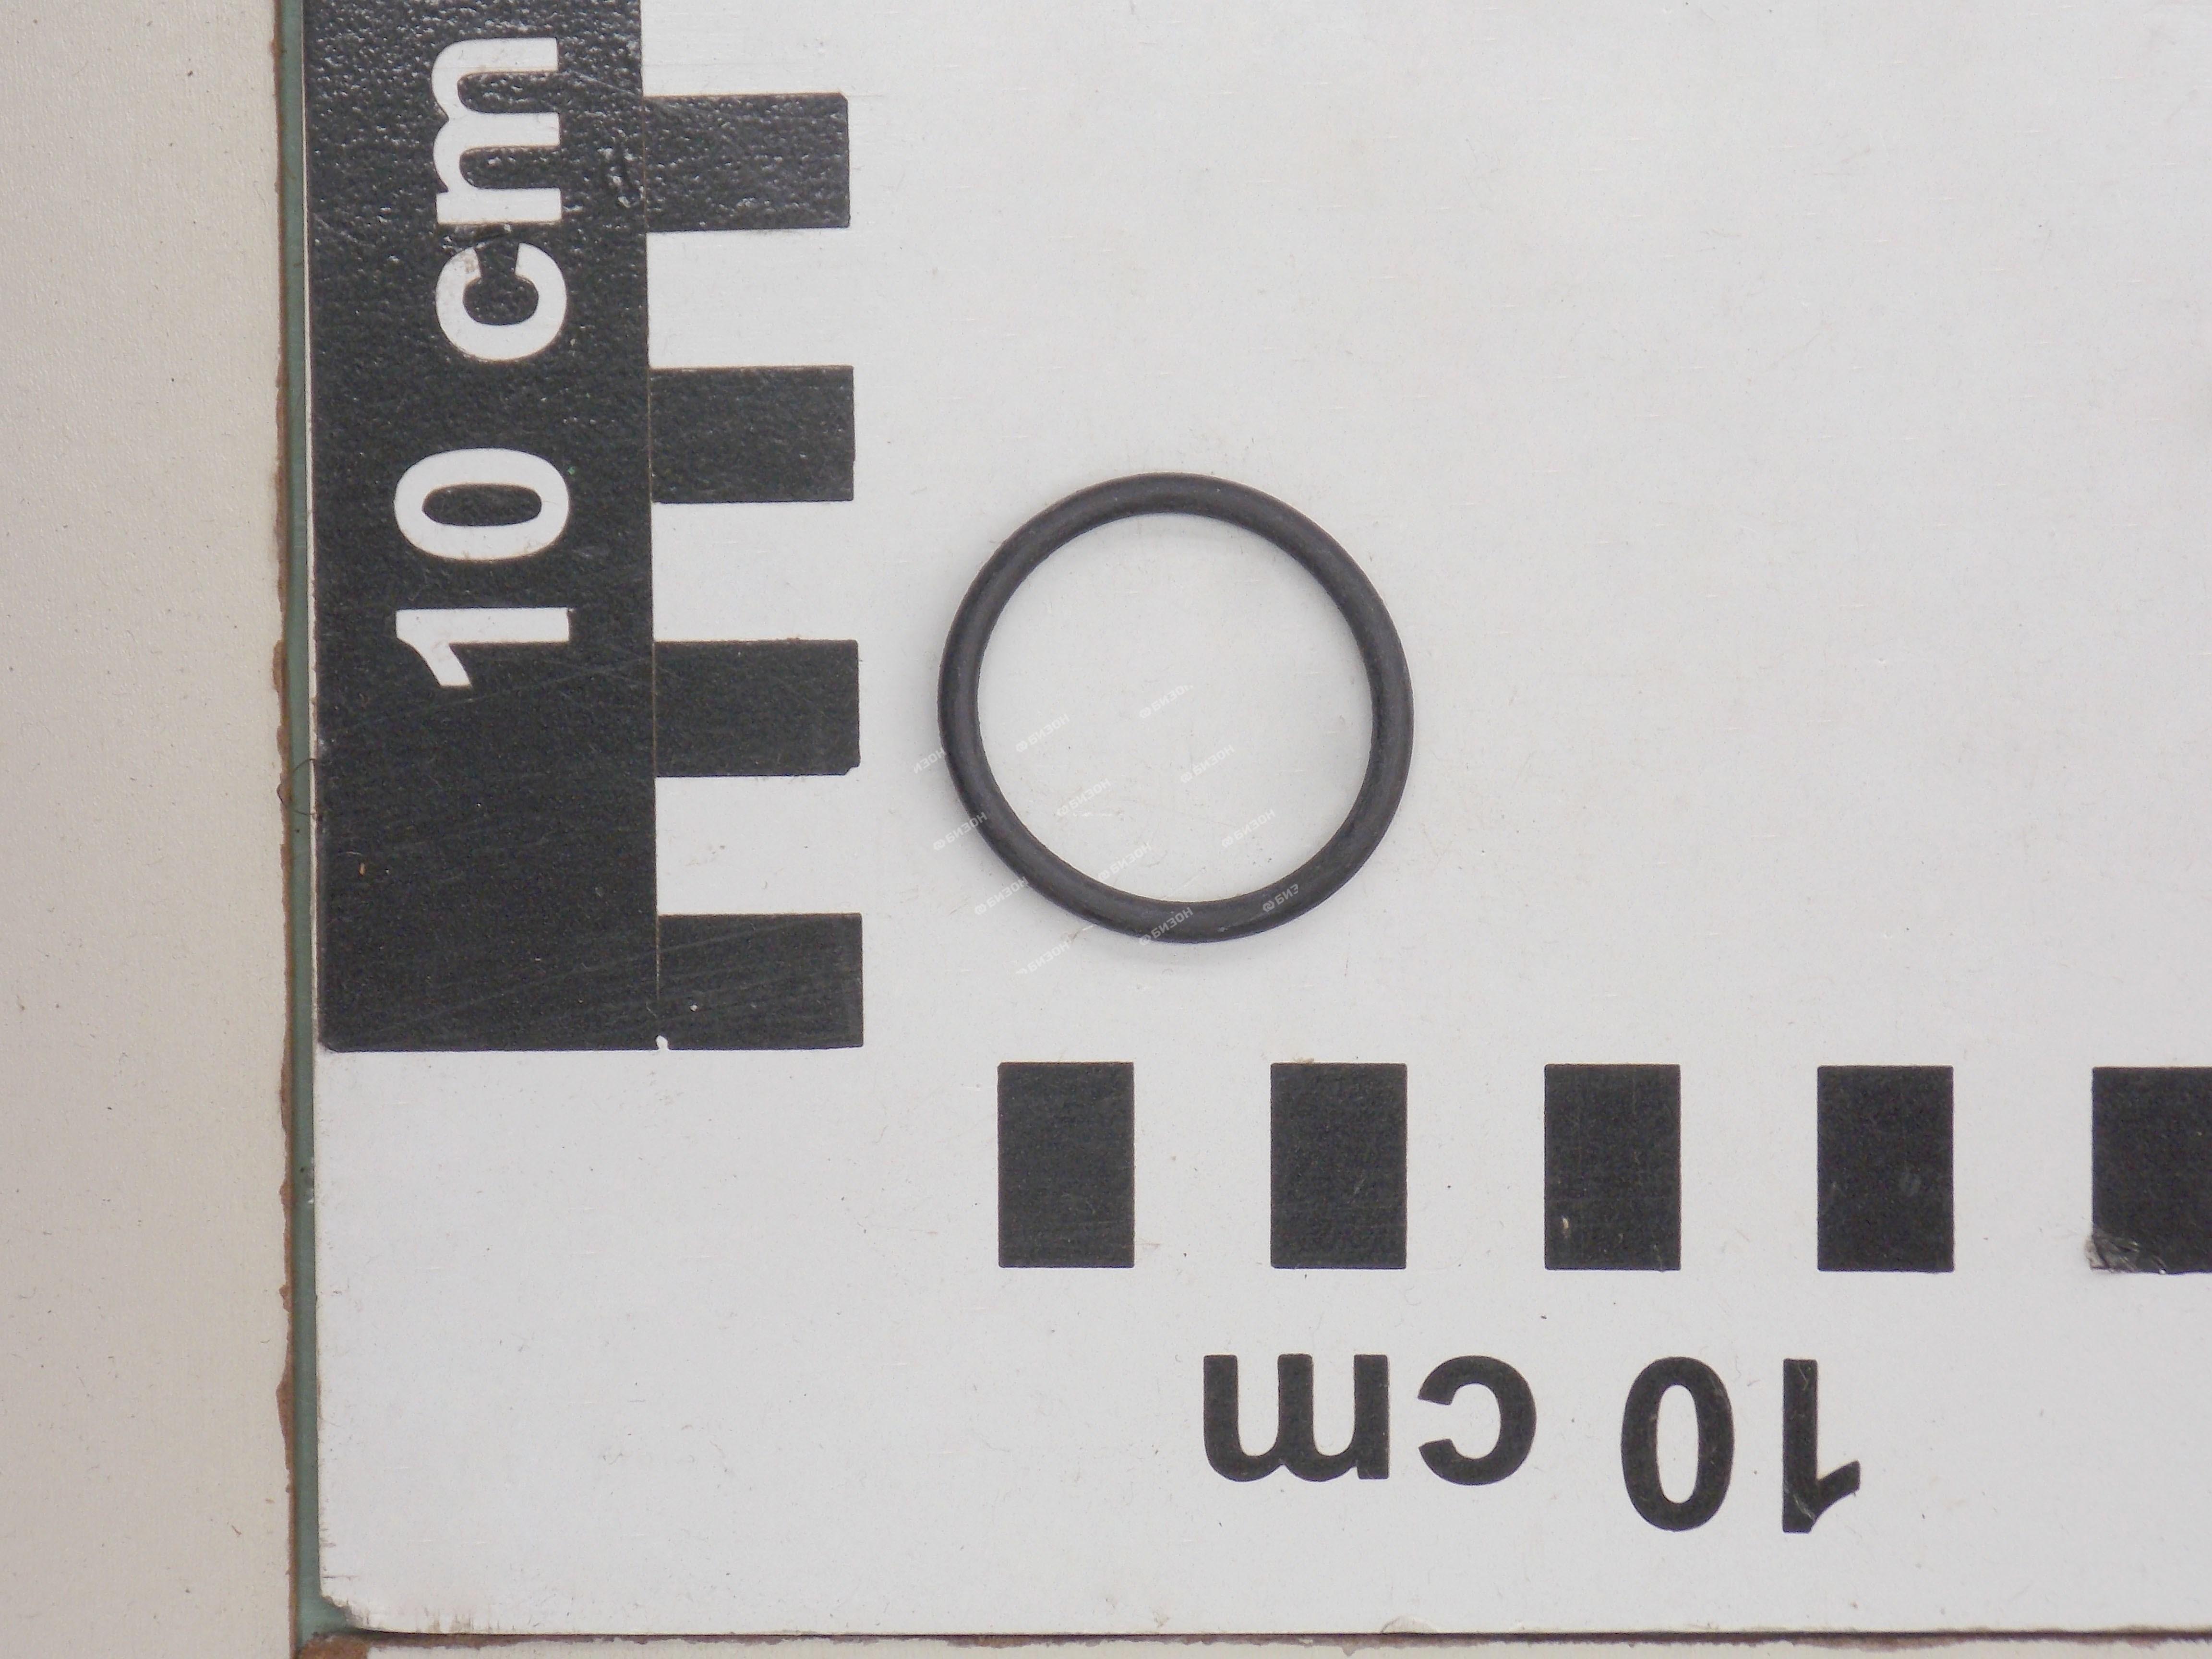 Кольцо 029-035-30 O-RING уплотн. резин. (Император Стара)